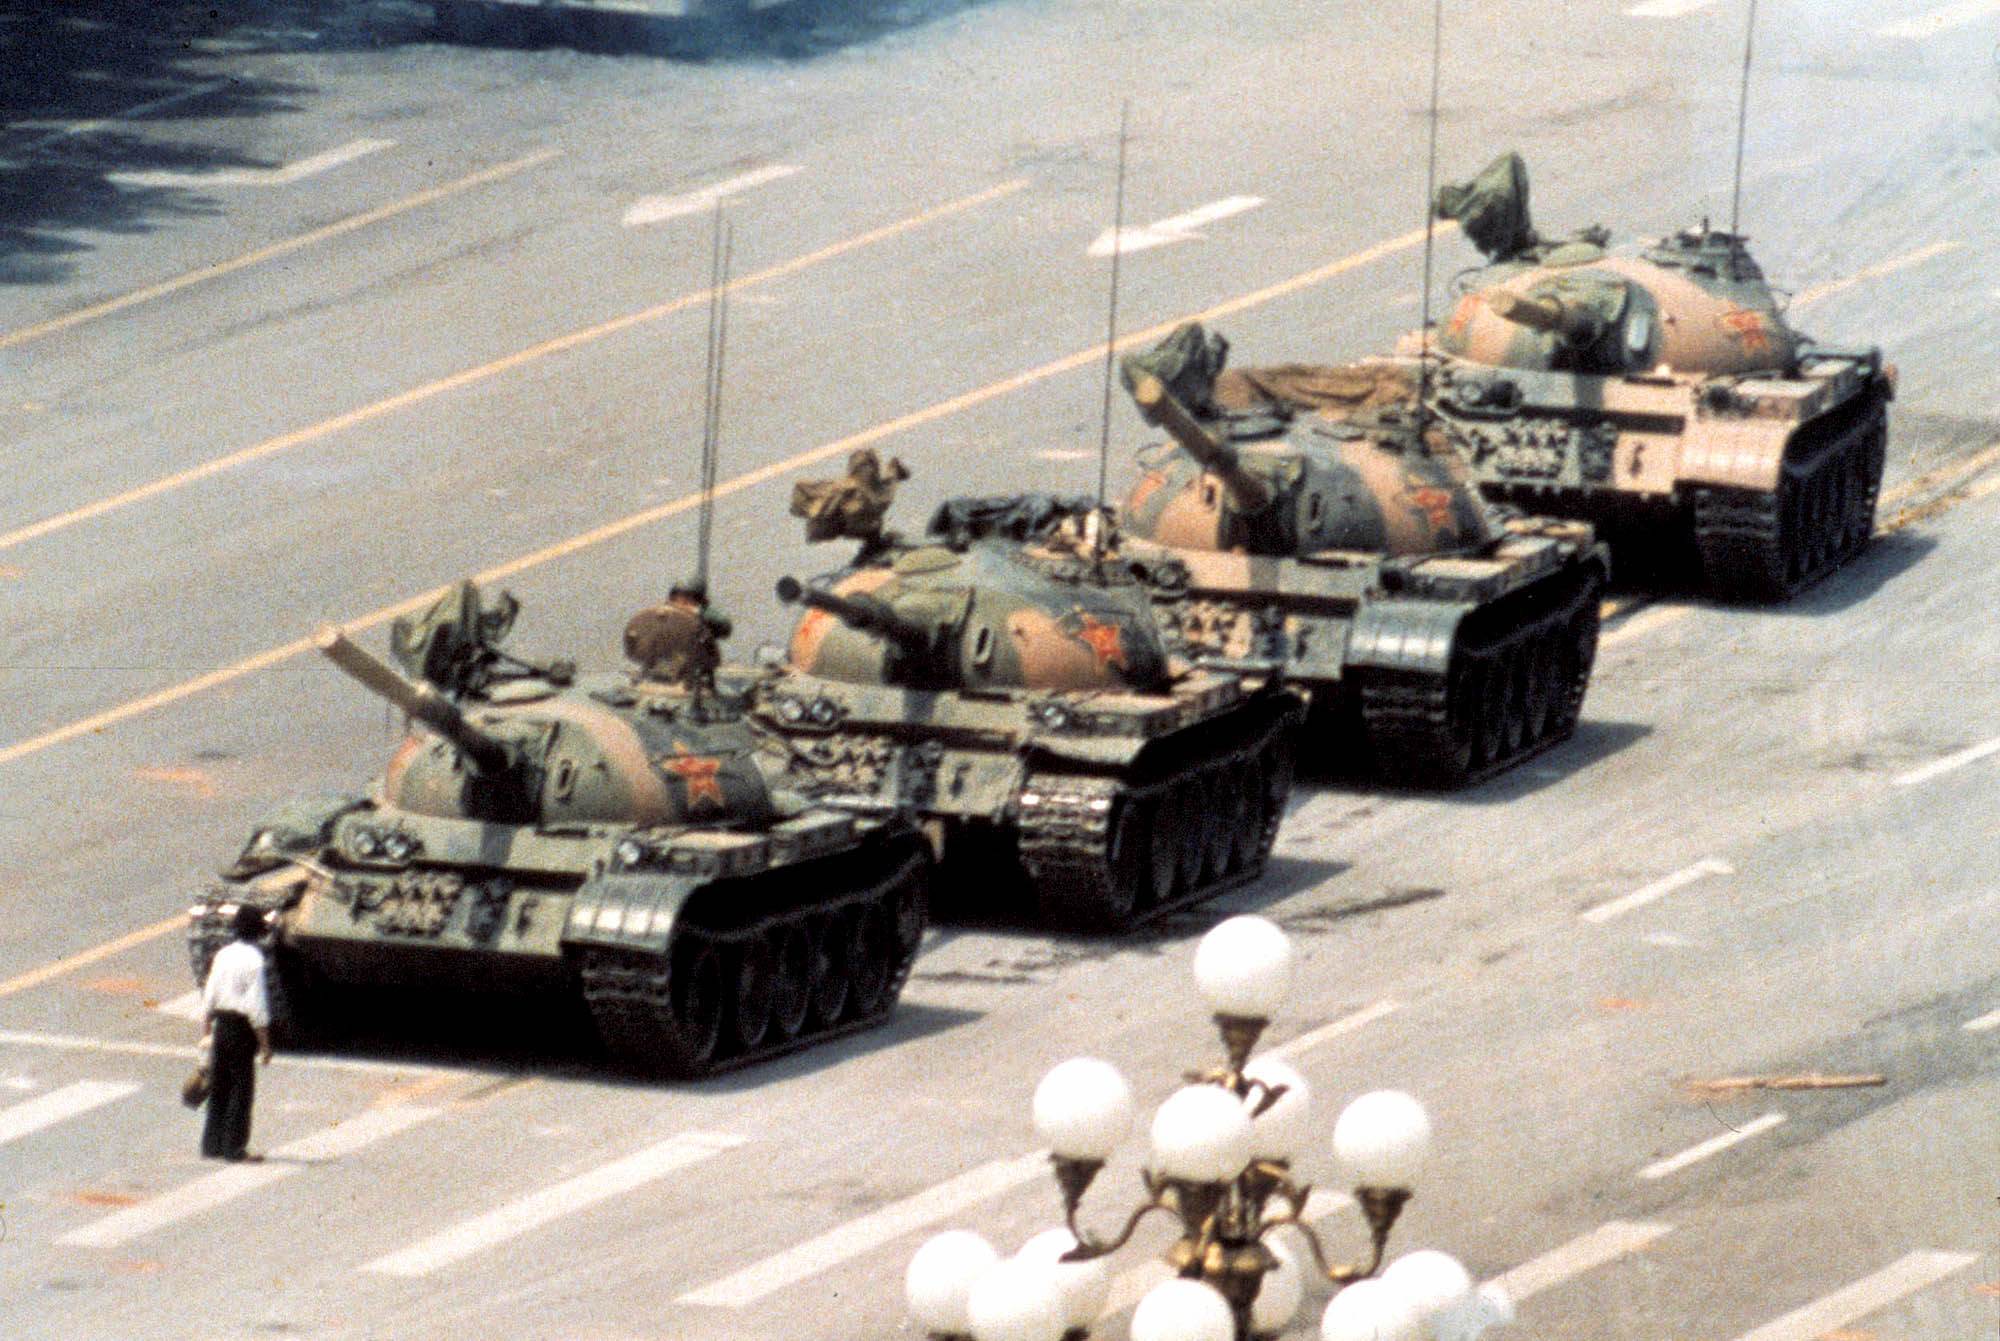 Tank Man - lone citizen vs. PLA tanks, Tiananmen Square, 1989, Jeff Widener